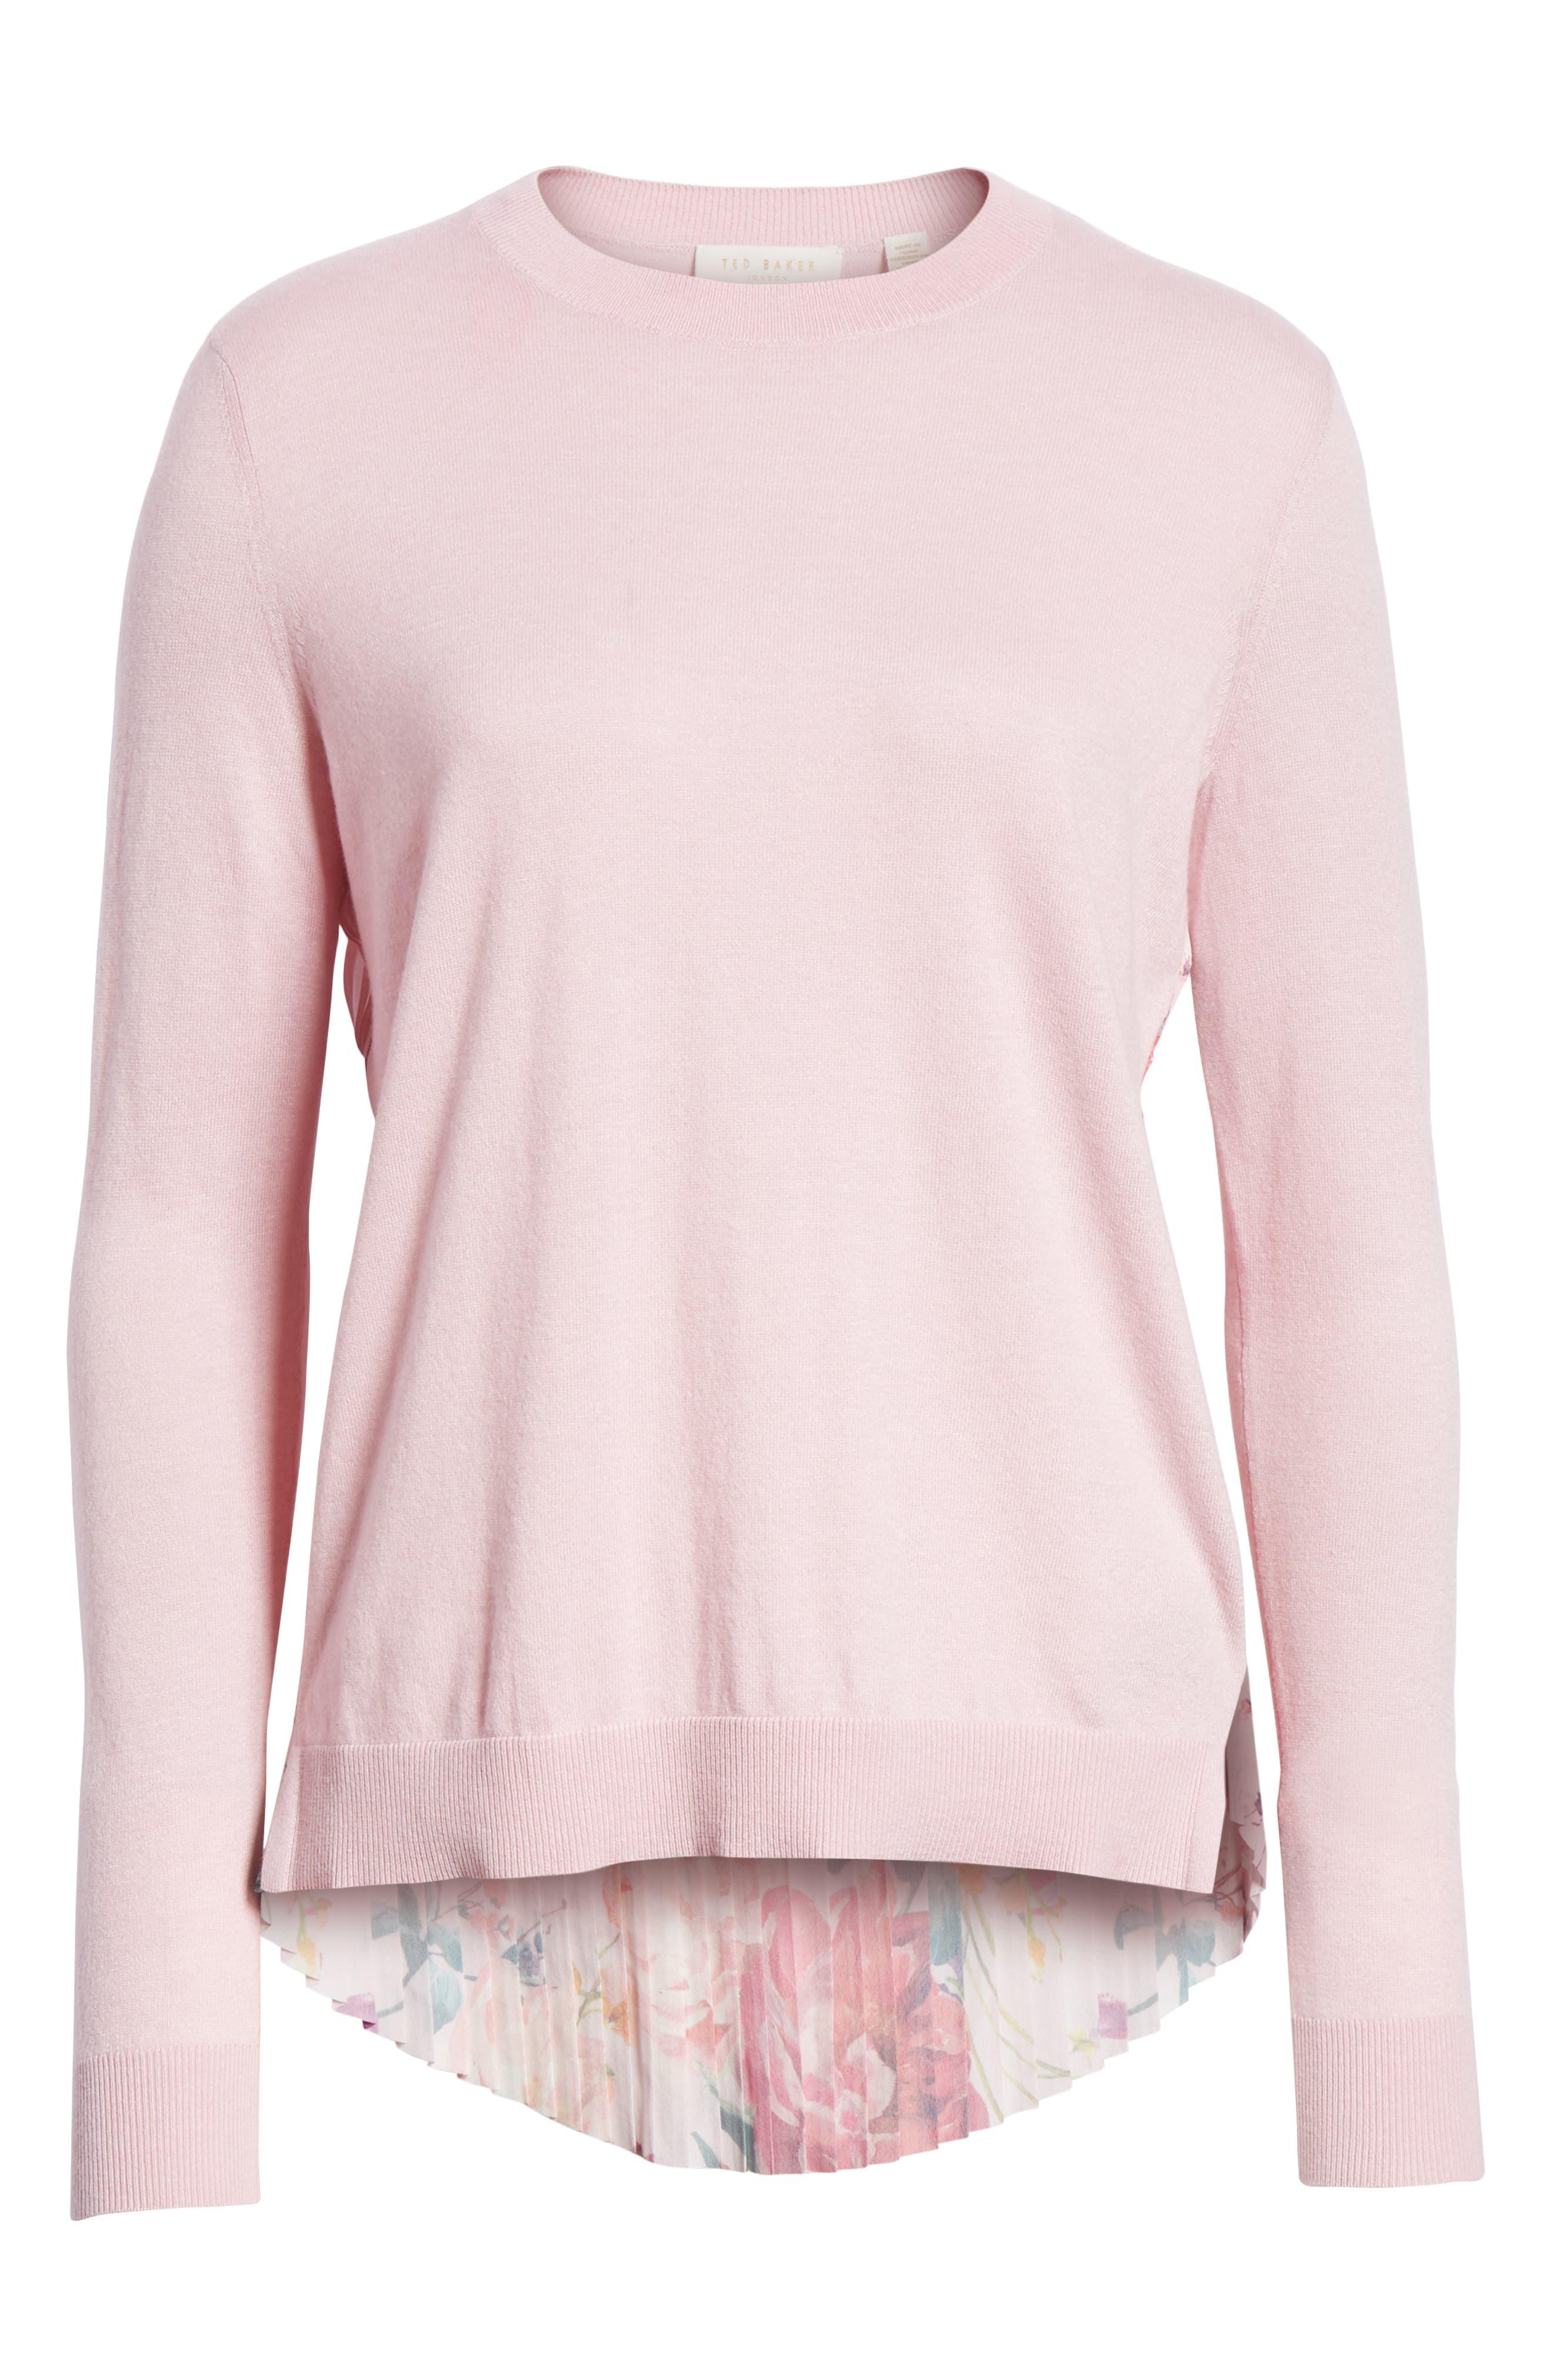 Kaleese Serenity Pleat Back Silk Cotton Sweater,                             Alternate thumbnail 6, color,                             531